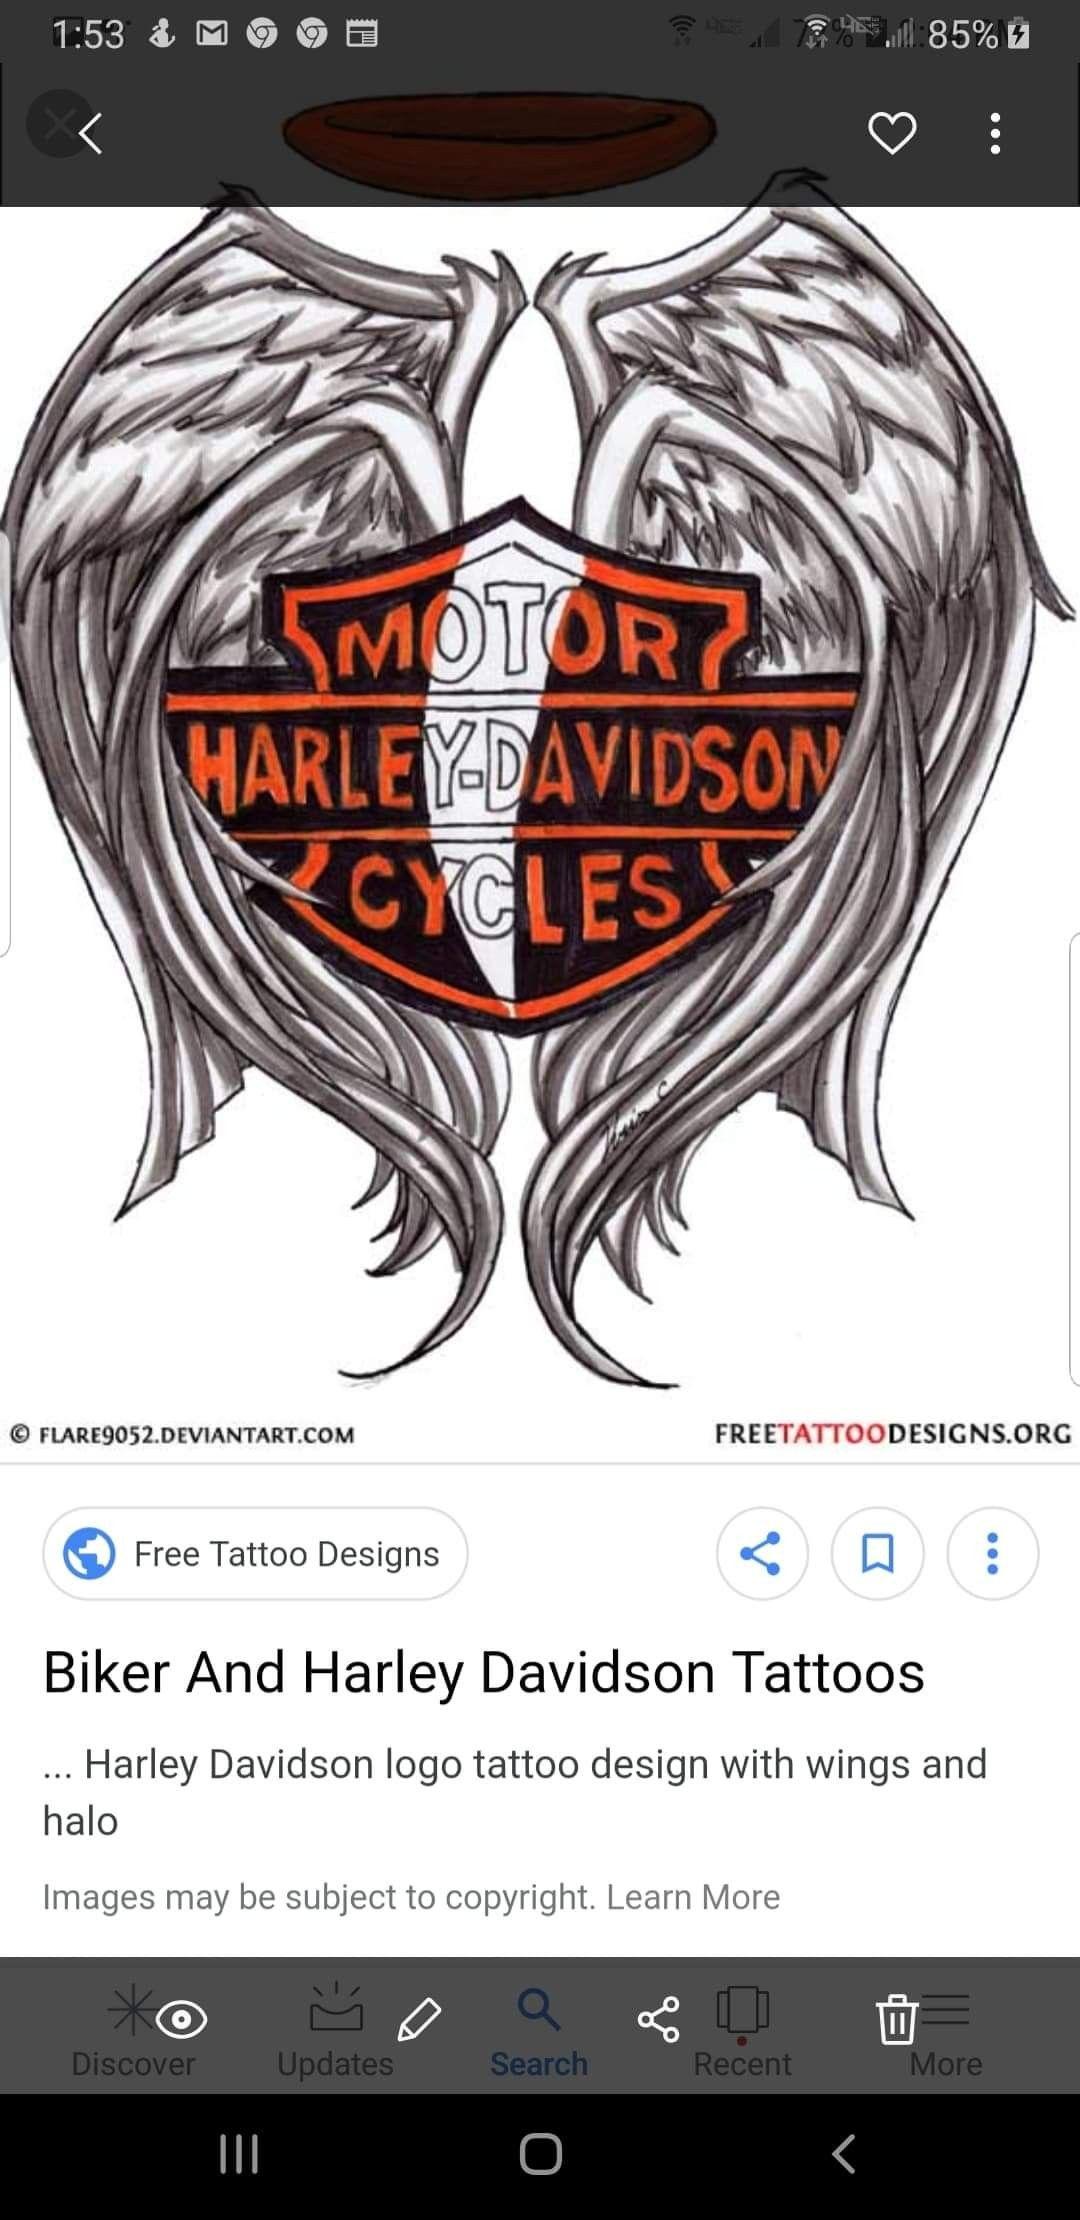 Pin By Reeta Shah On Sketches Free Tattoo Designs Harley Davidson Tattoos Harley Davidson Logo